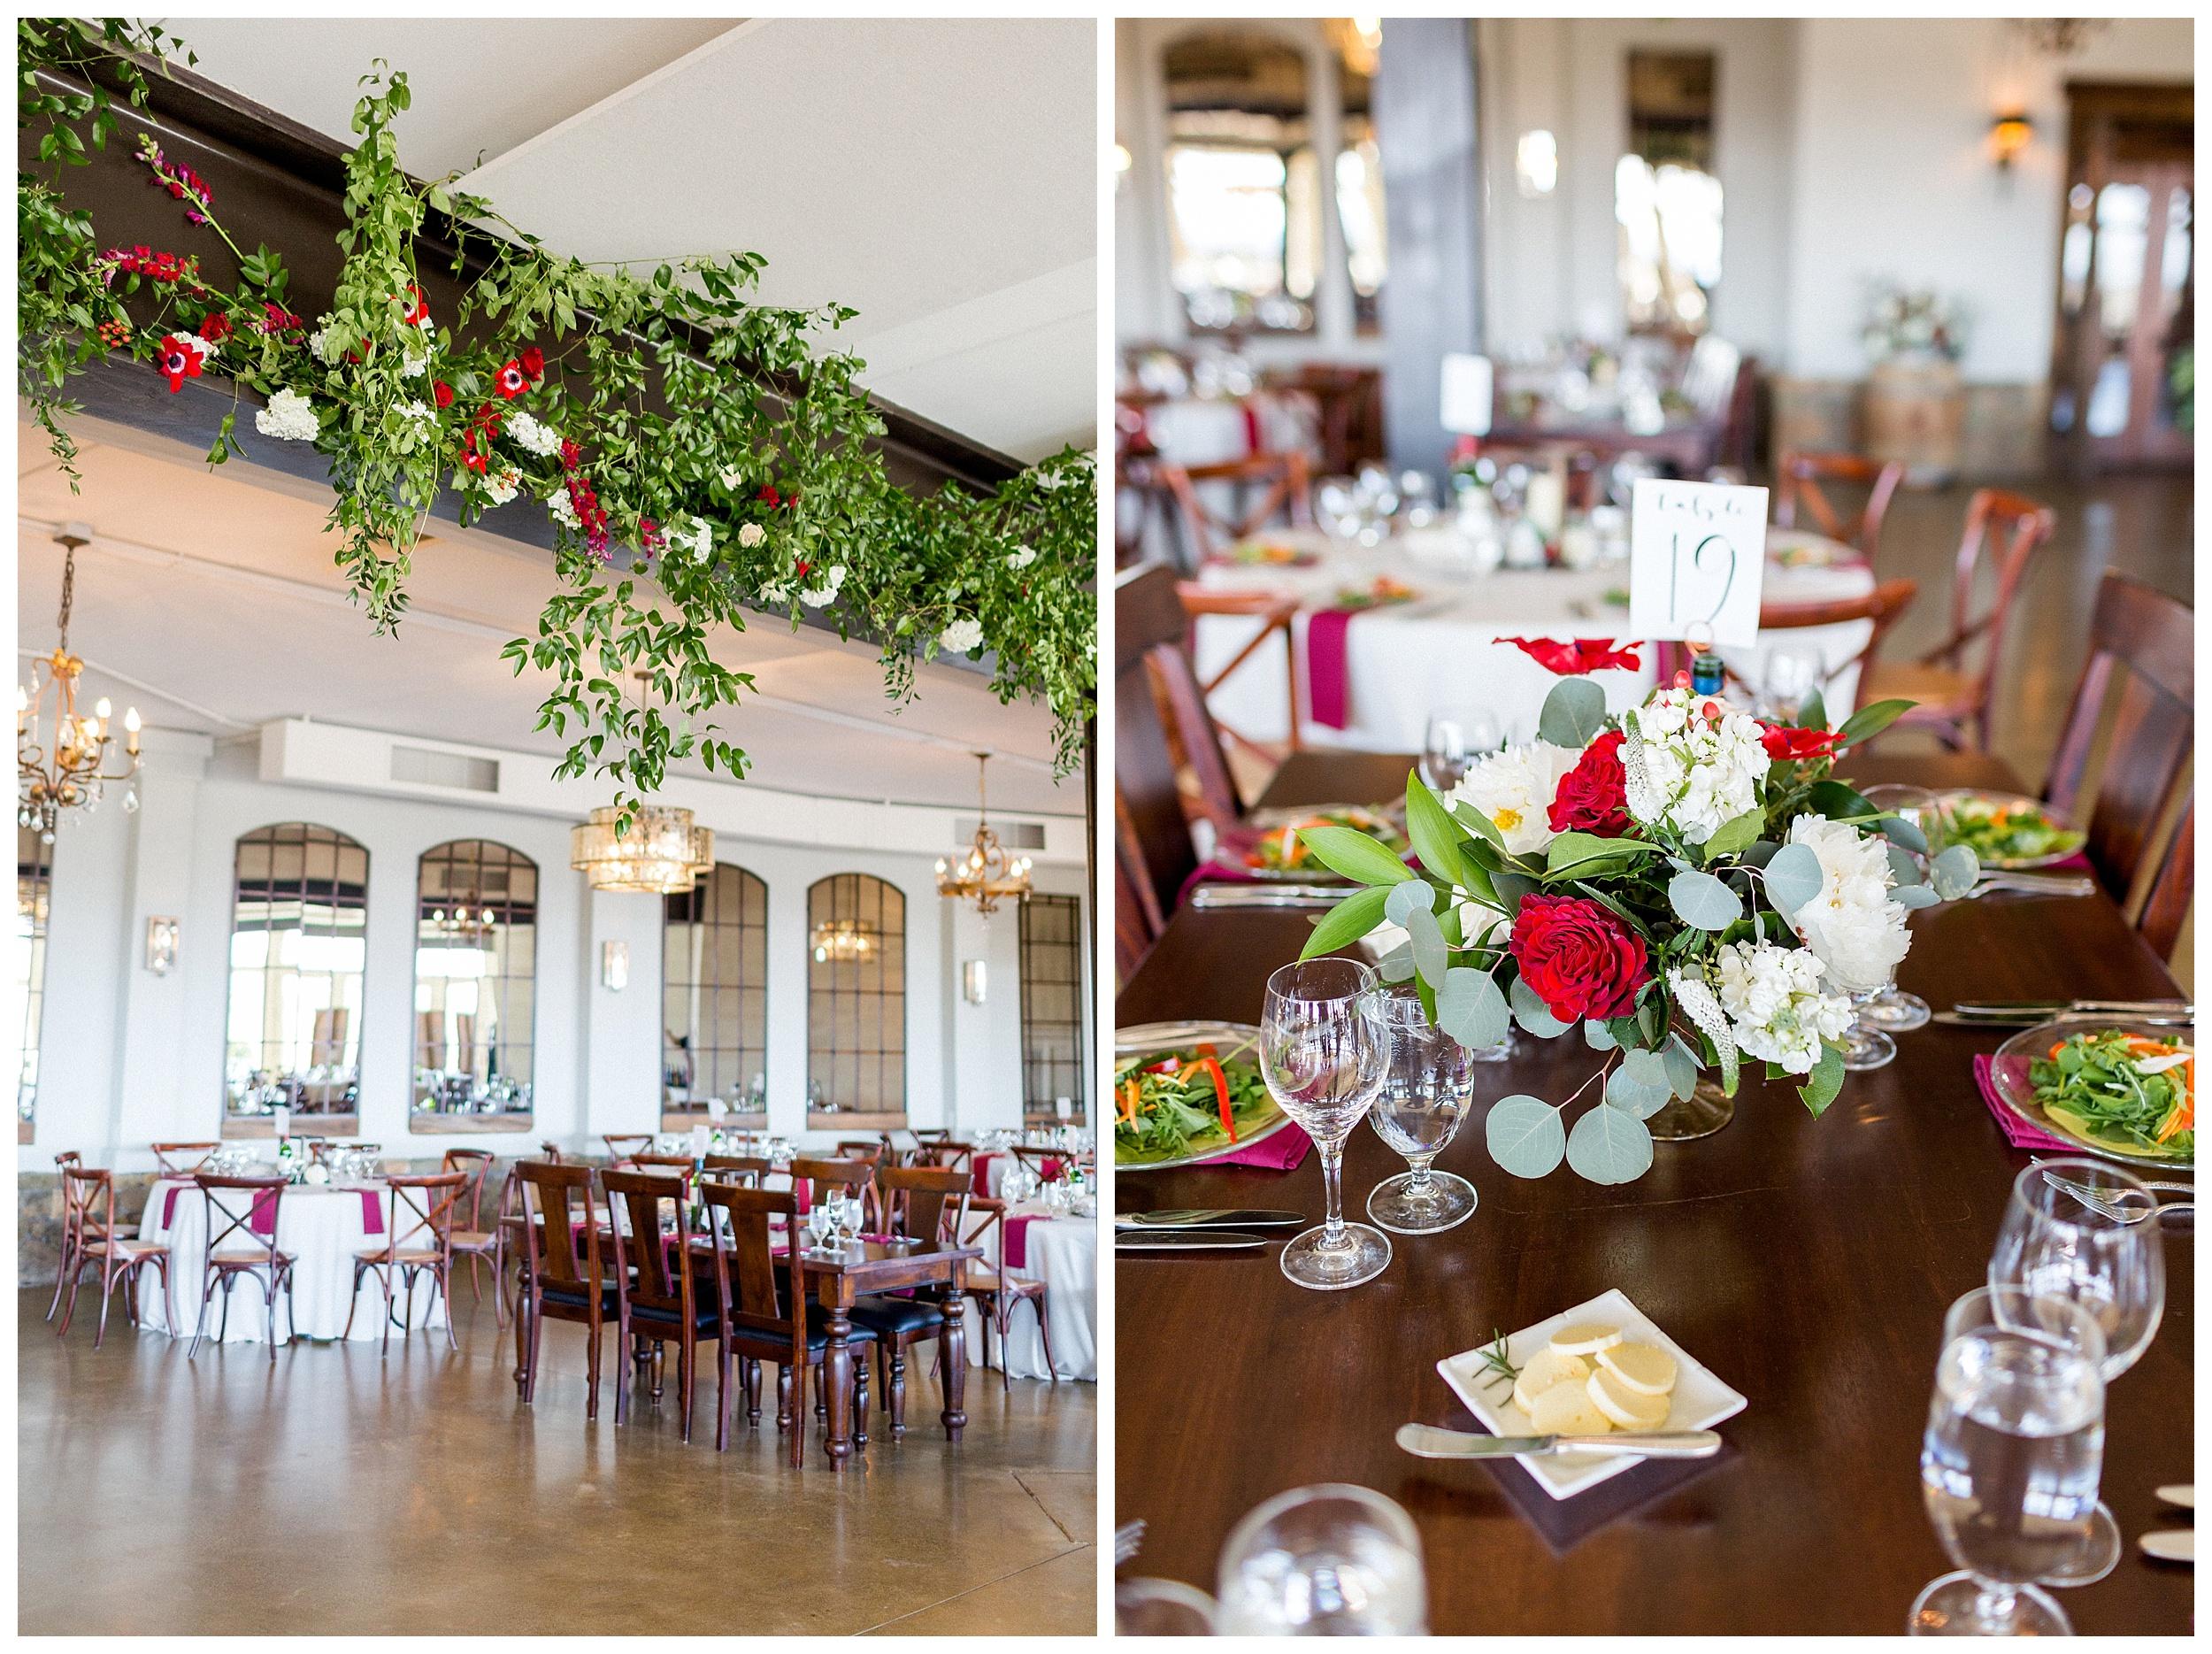 Stone Tower Winery Wedding | Virginia Winter Wedding | VA Wedding Photographer Kir Tuben_0089.jpg